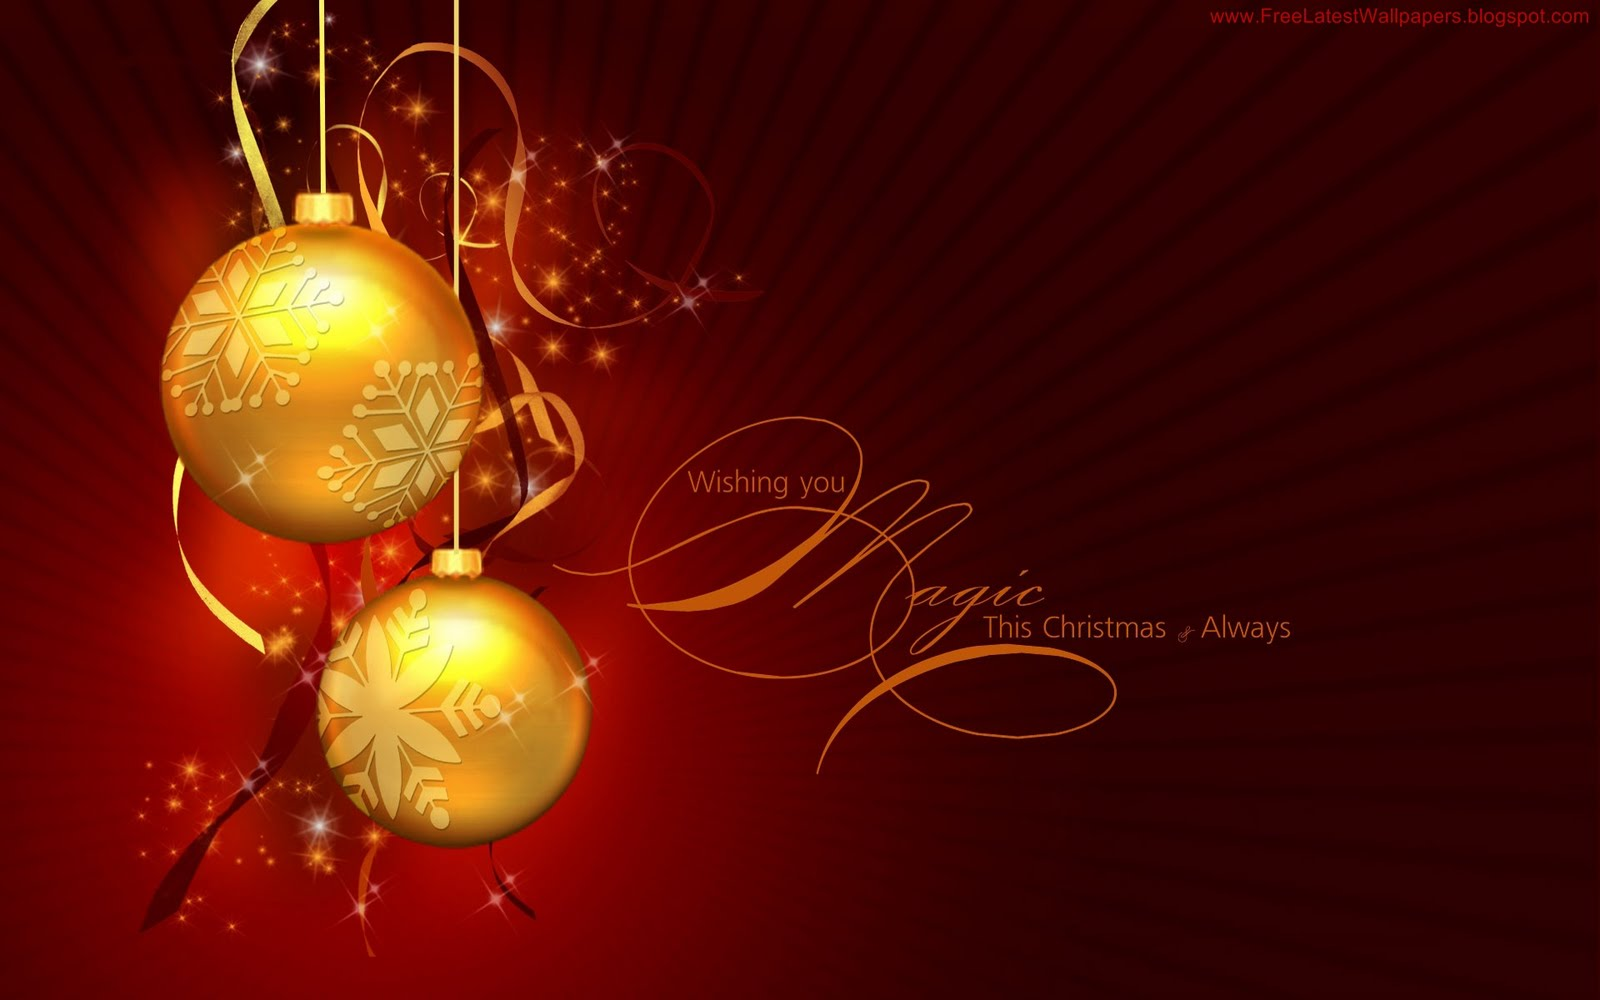 http://1.bp.blogspot.com/_DTtGJfwRB7I/TRWKM9JG00I/AAAAAAAAAR4/uiTGmNY57KU/s1600/Christmas%2BHD%2BWallpapers%2B1920x1200%2B%252822%2529.jpg